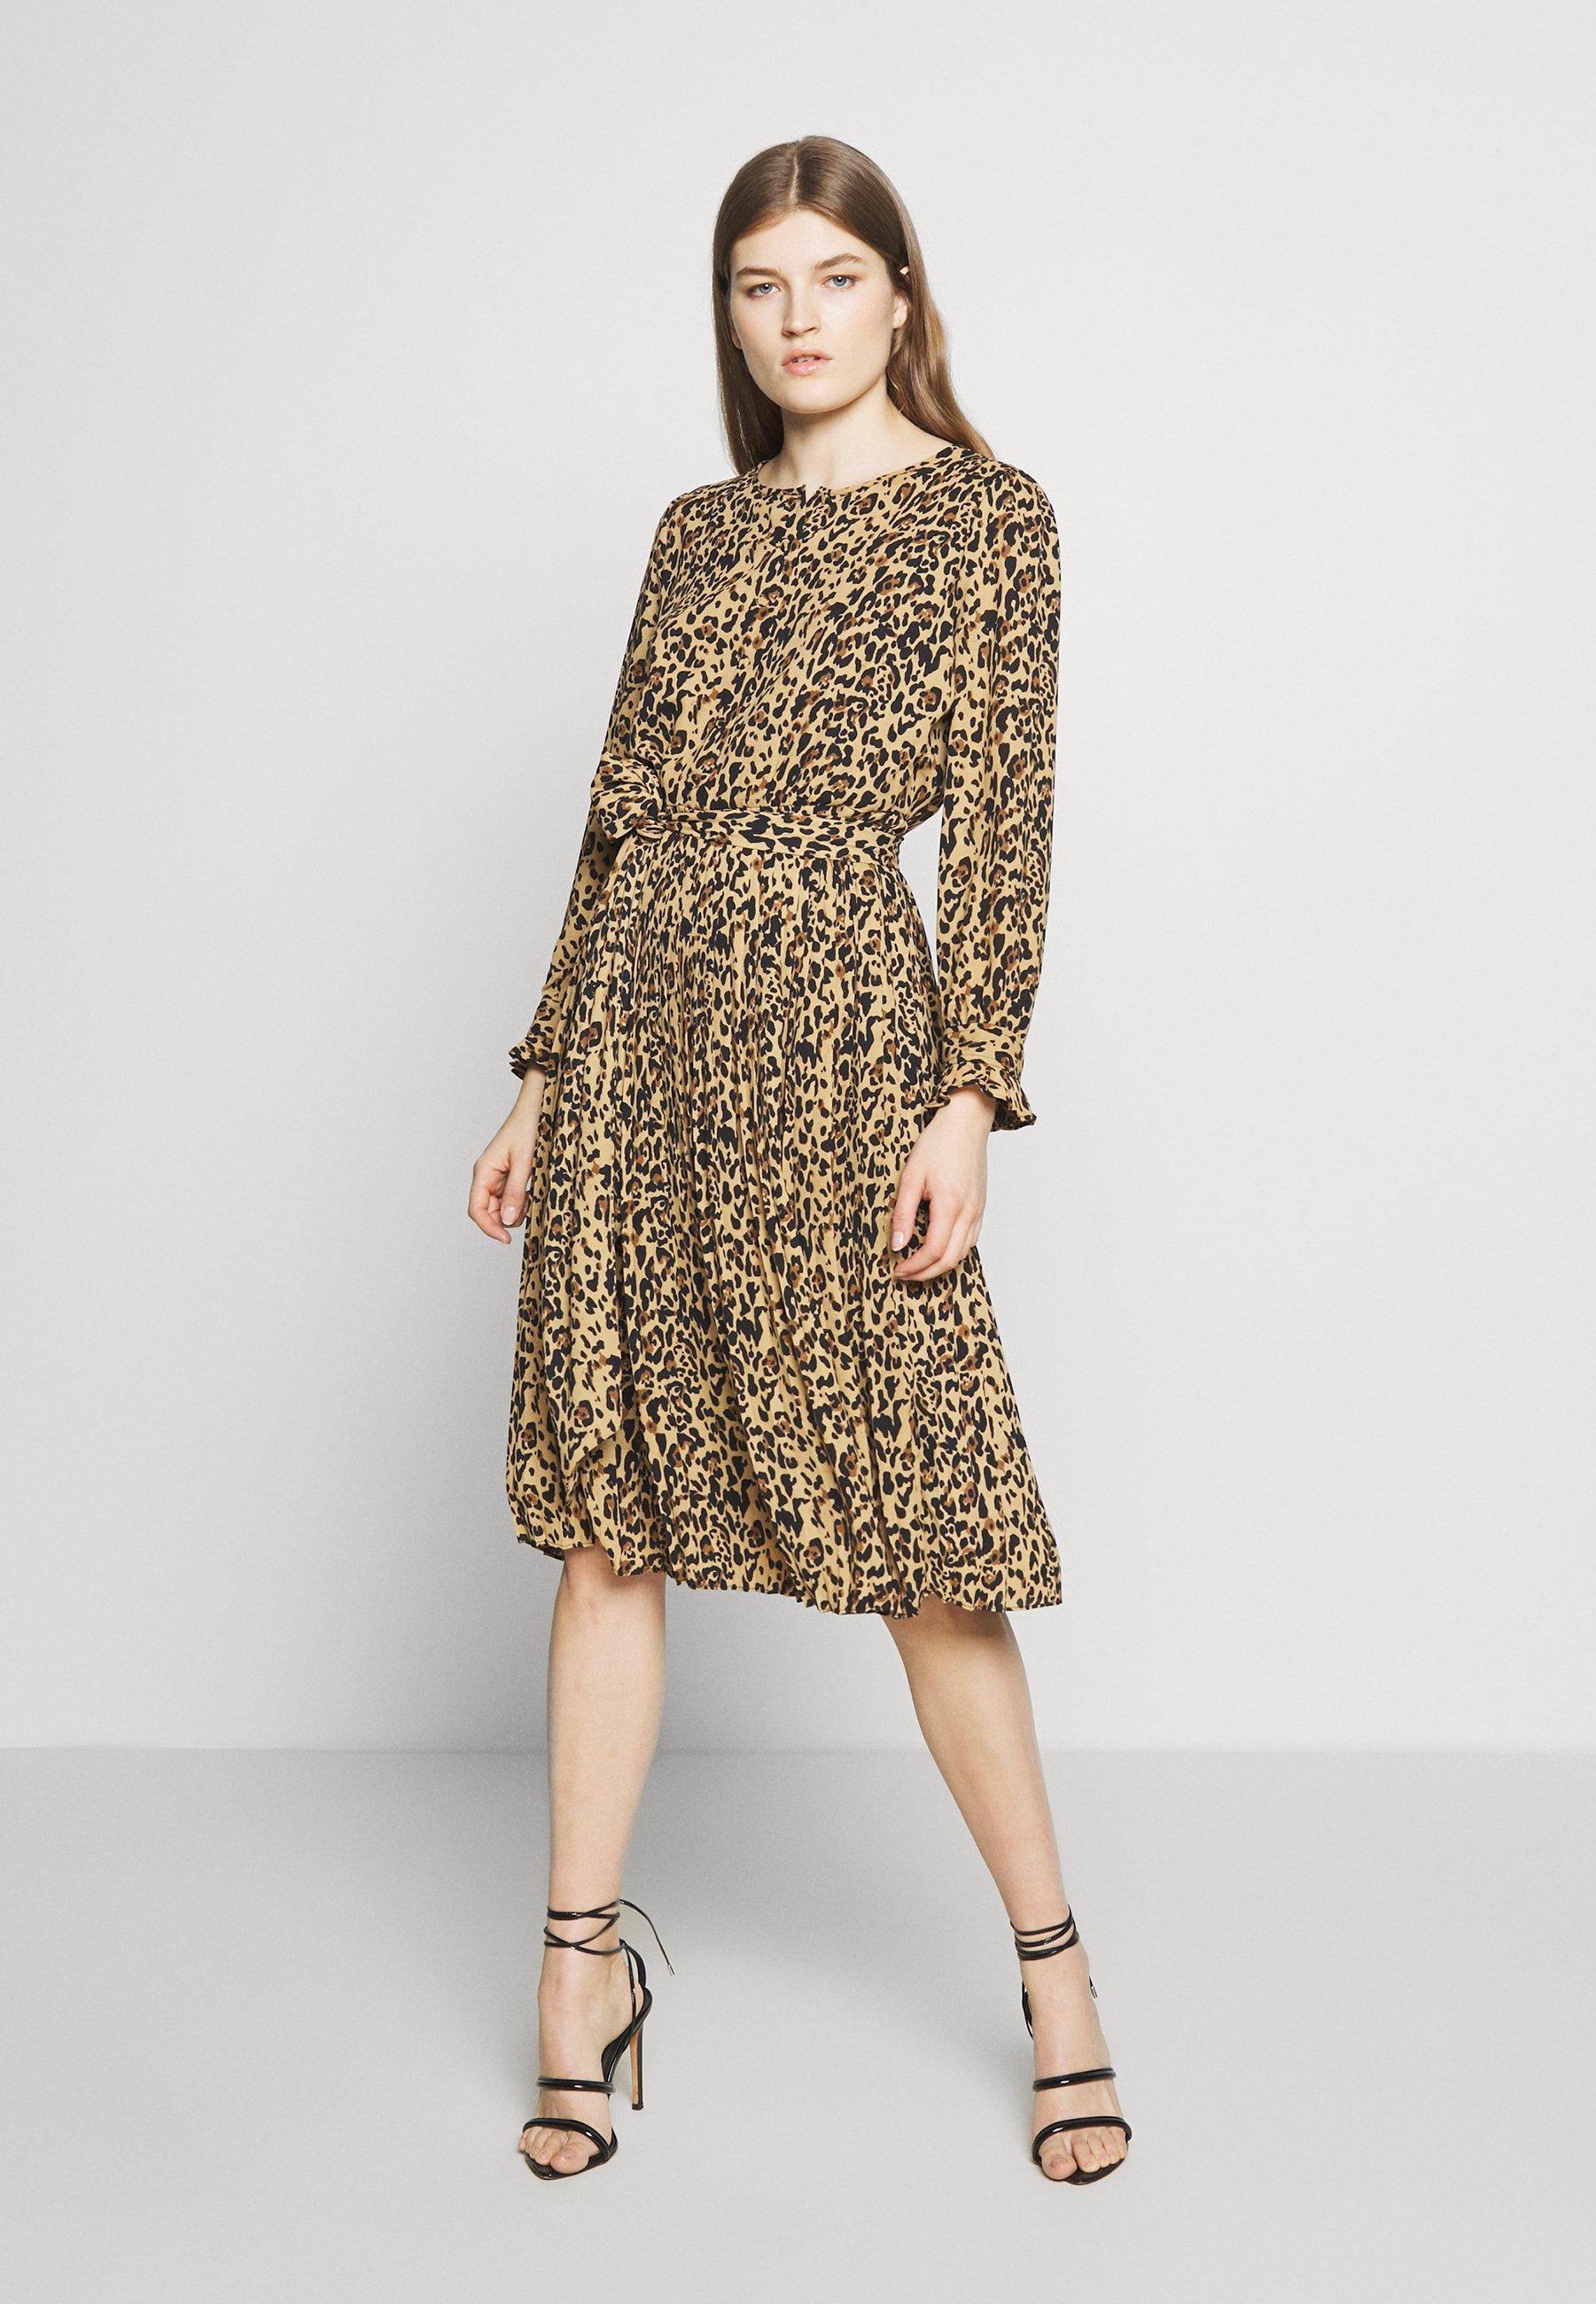 J.CREW LEOPARD CARLY DRESS Kjole ocelot multi Zalando.no